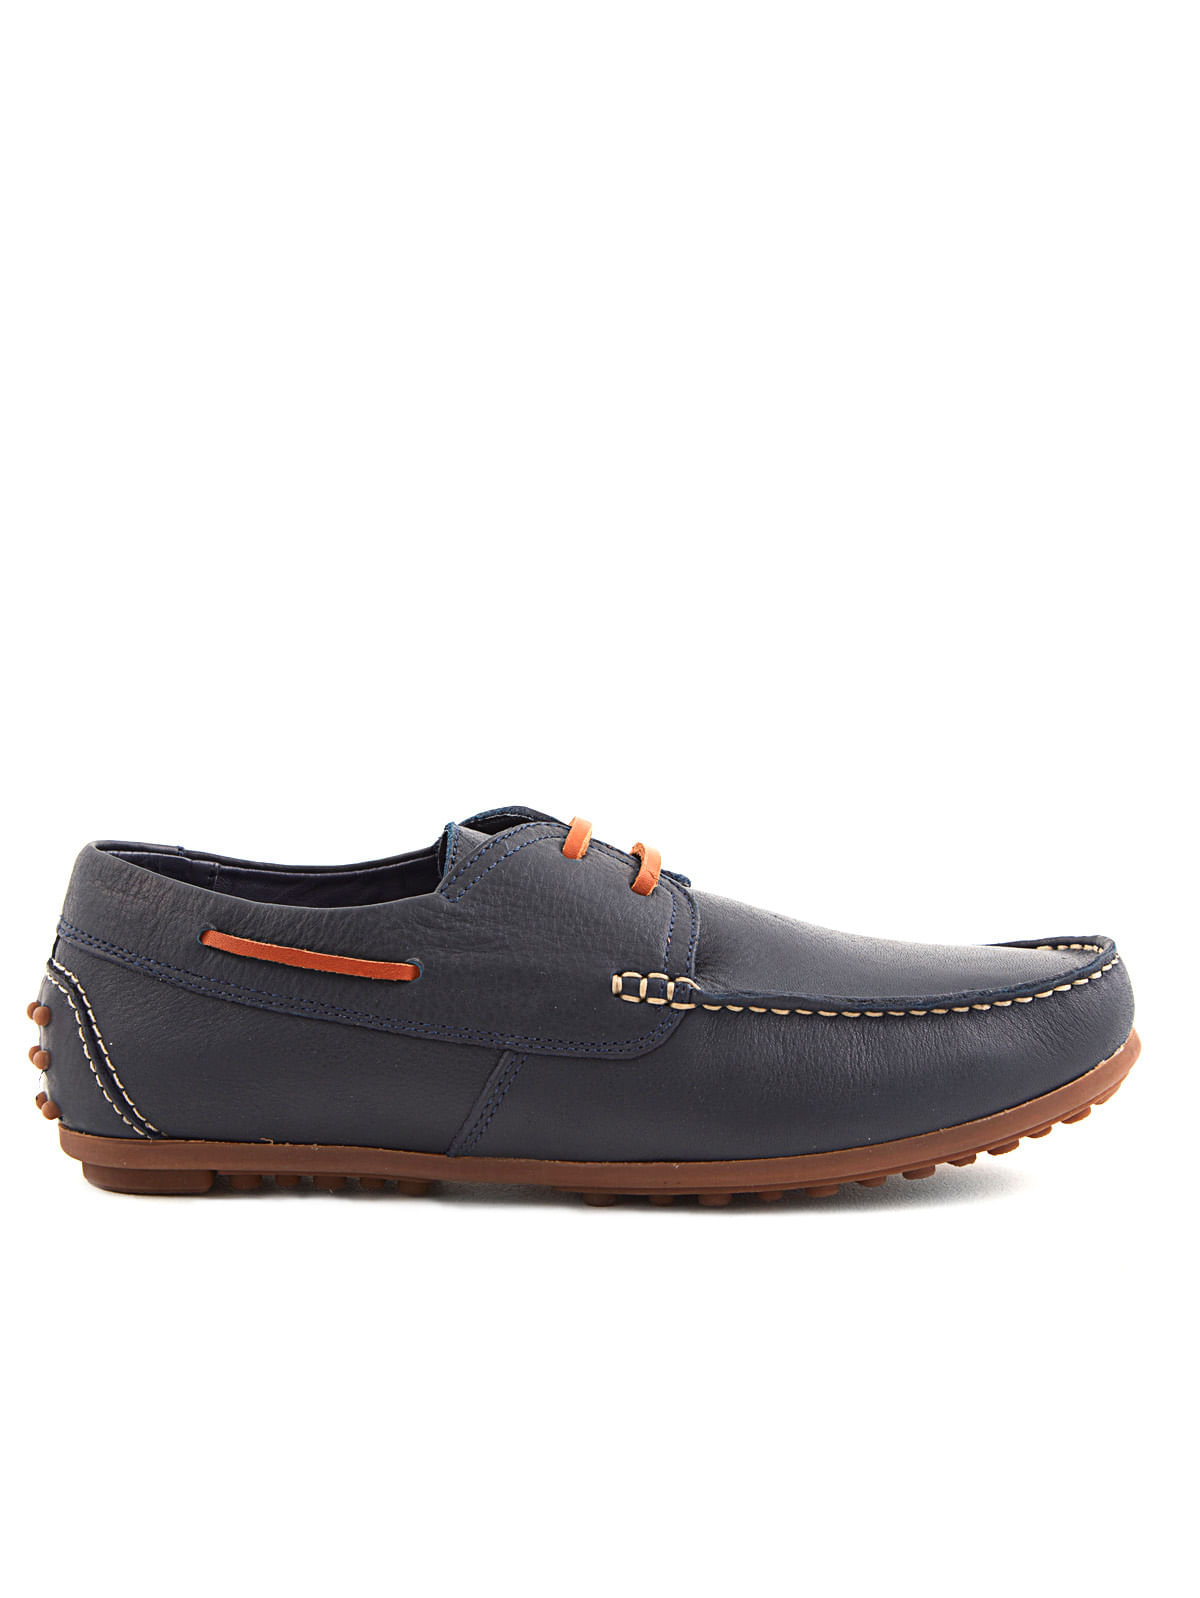 5113b4f46 Zapato Casual de Cuero Estilo Náutico 68020 - Arturo Calle